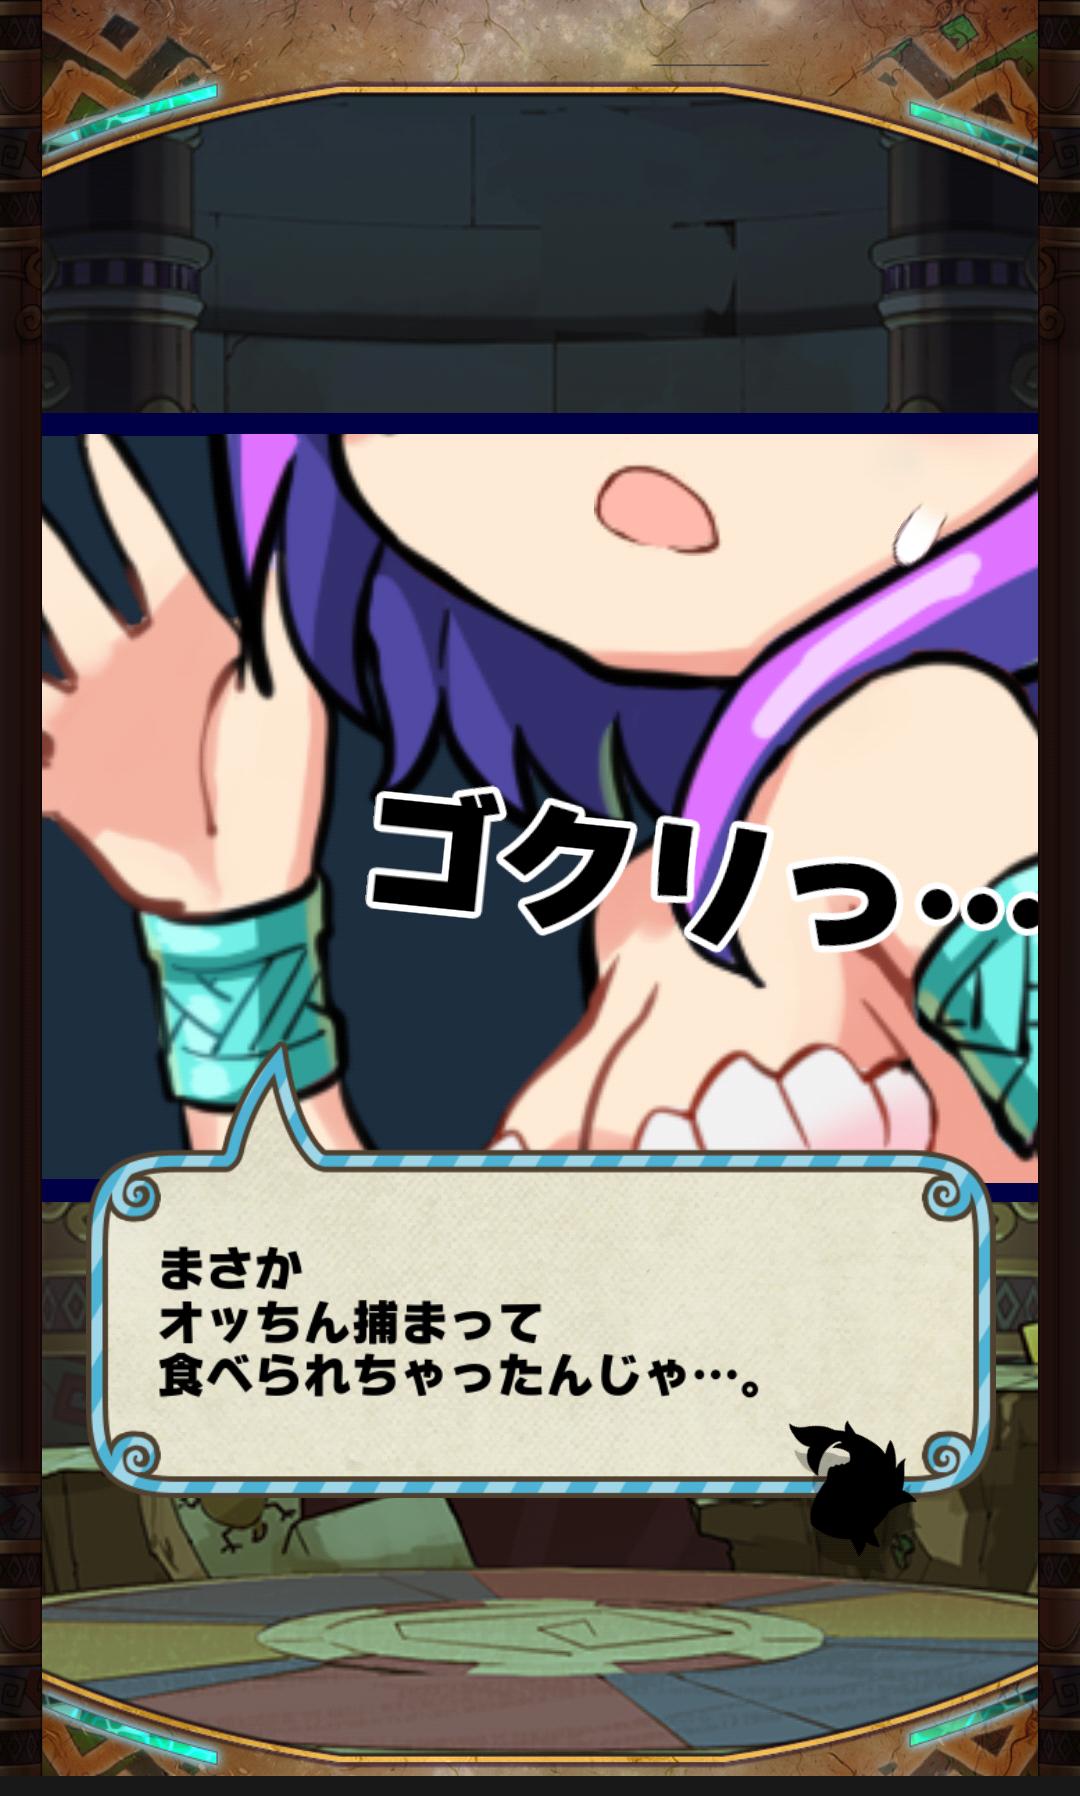 androidアプリ アニモン 人魚姫マーメの冒険攻略スクリーンショット5